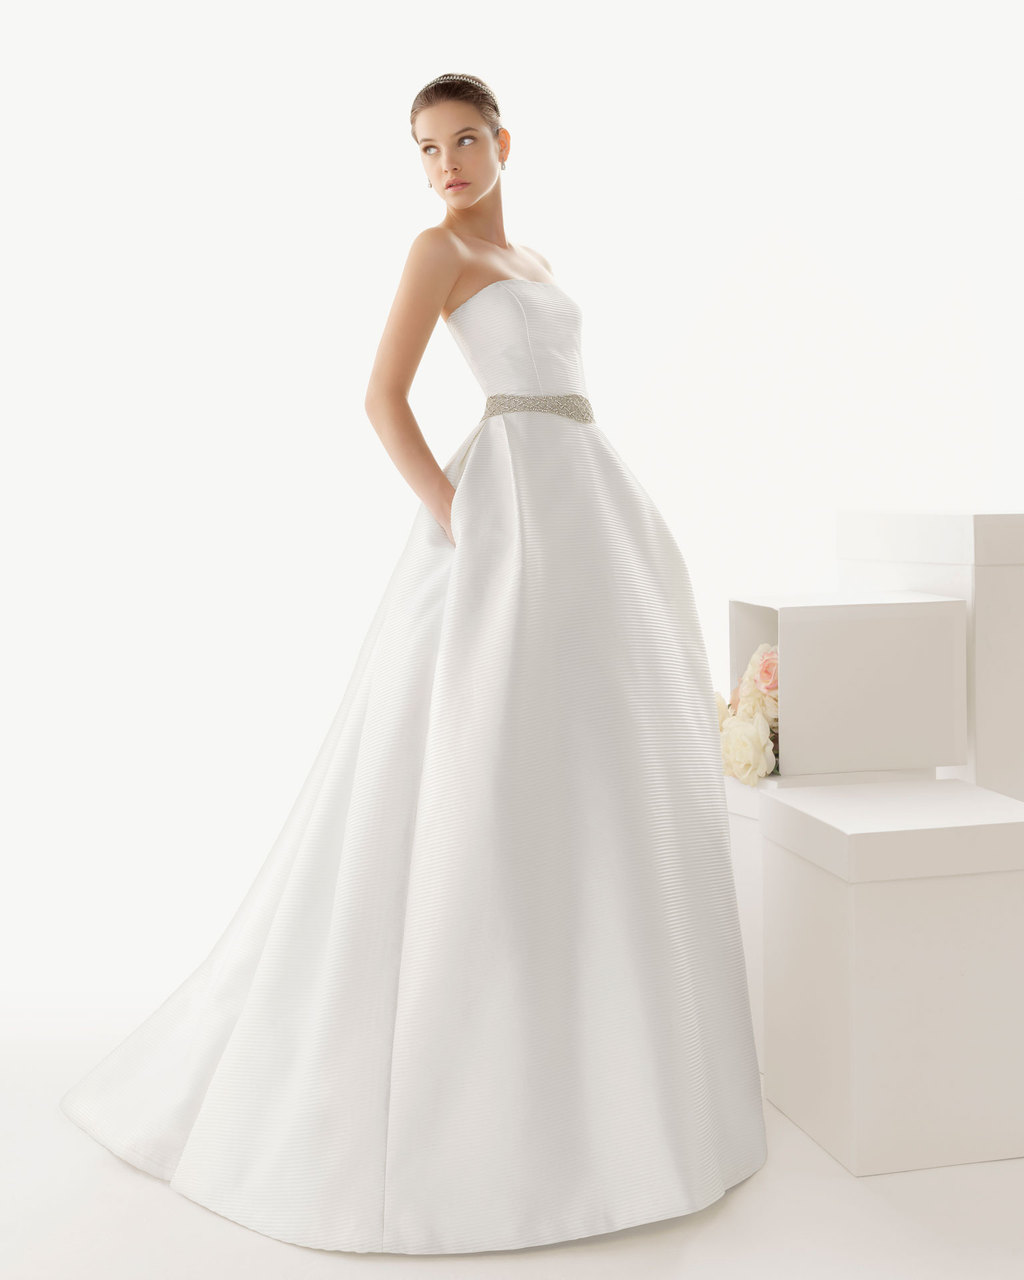 Transforming-wedding-dresses-2013-bridal-gown-by-rosa-clara-6.full